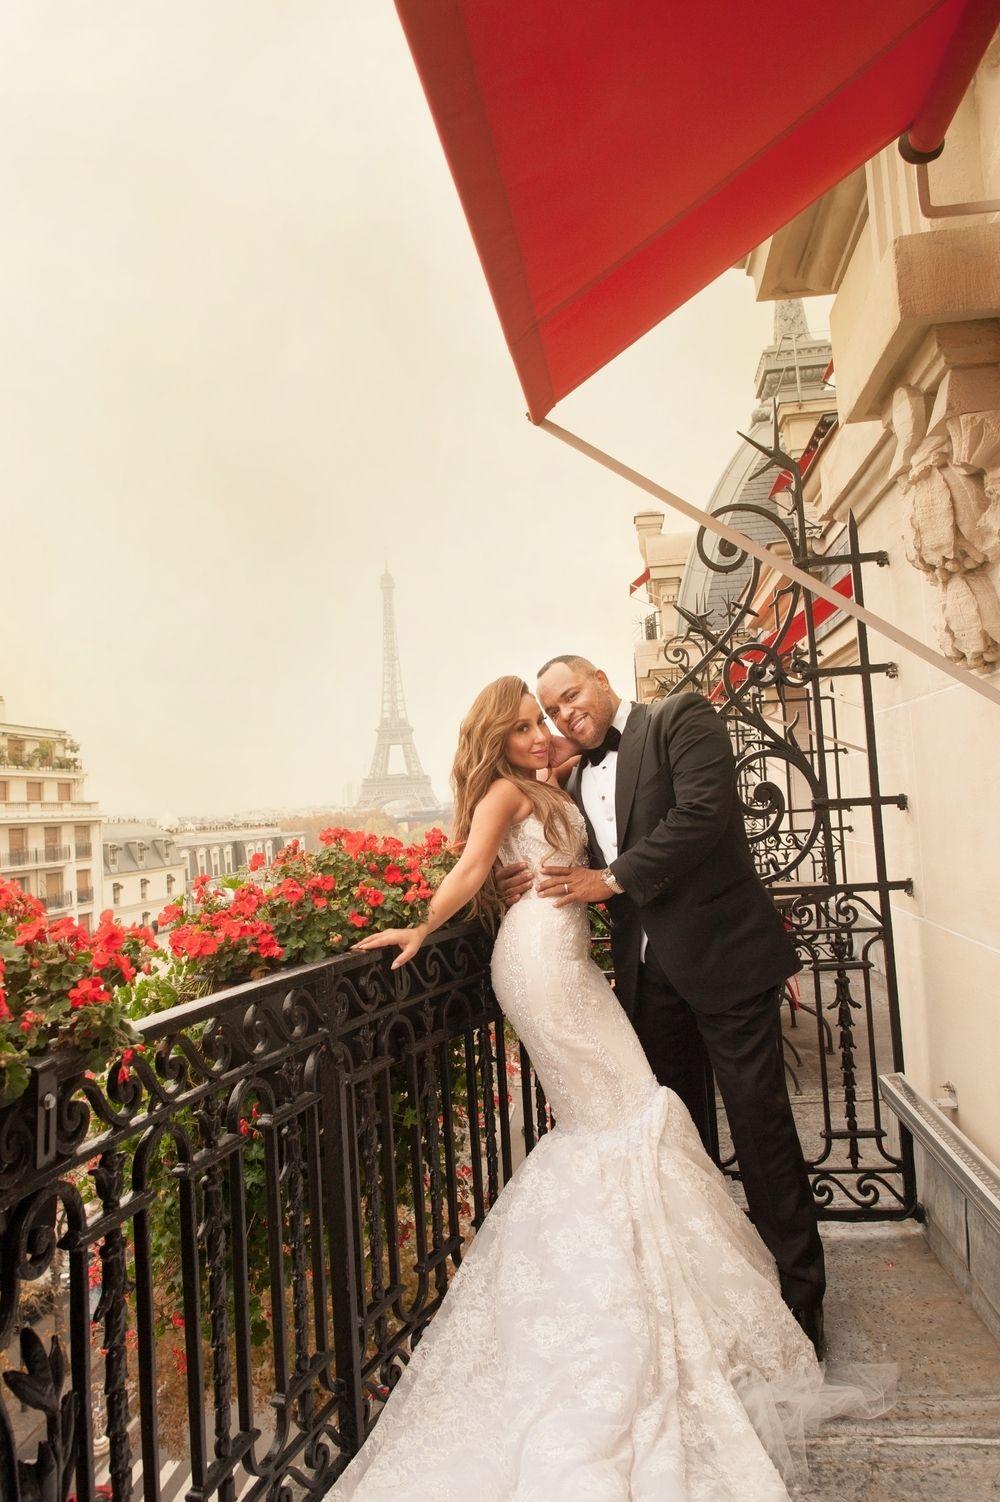 4010711d42f Adrienne Bailon s celeb wedding  Adrienne Bailon s Paris Wedding Photos